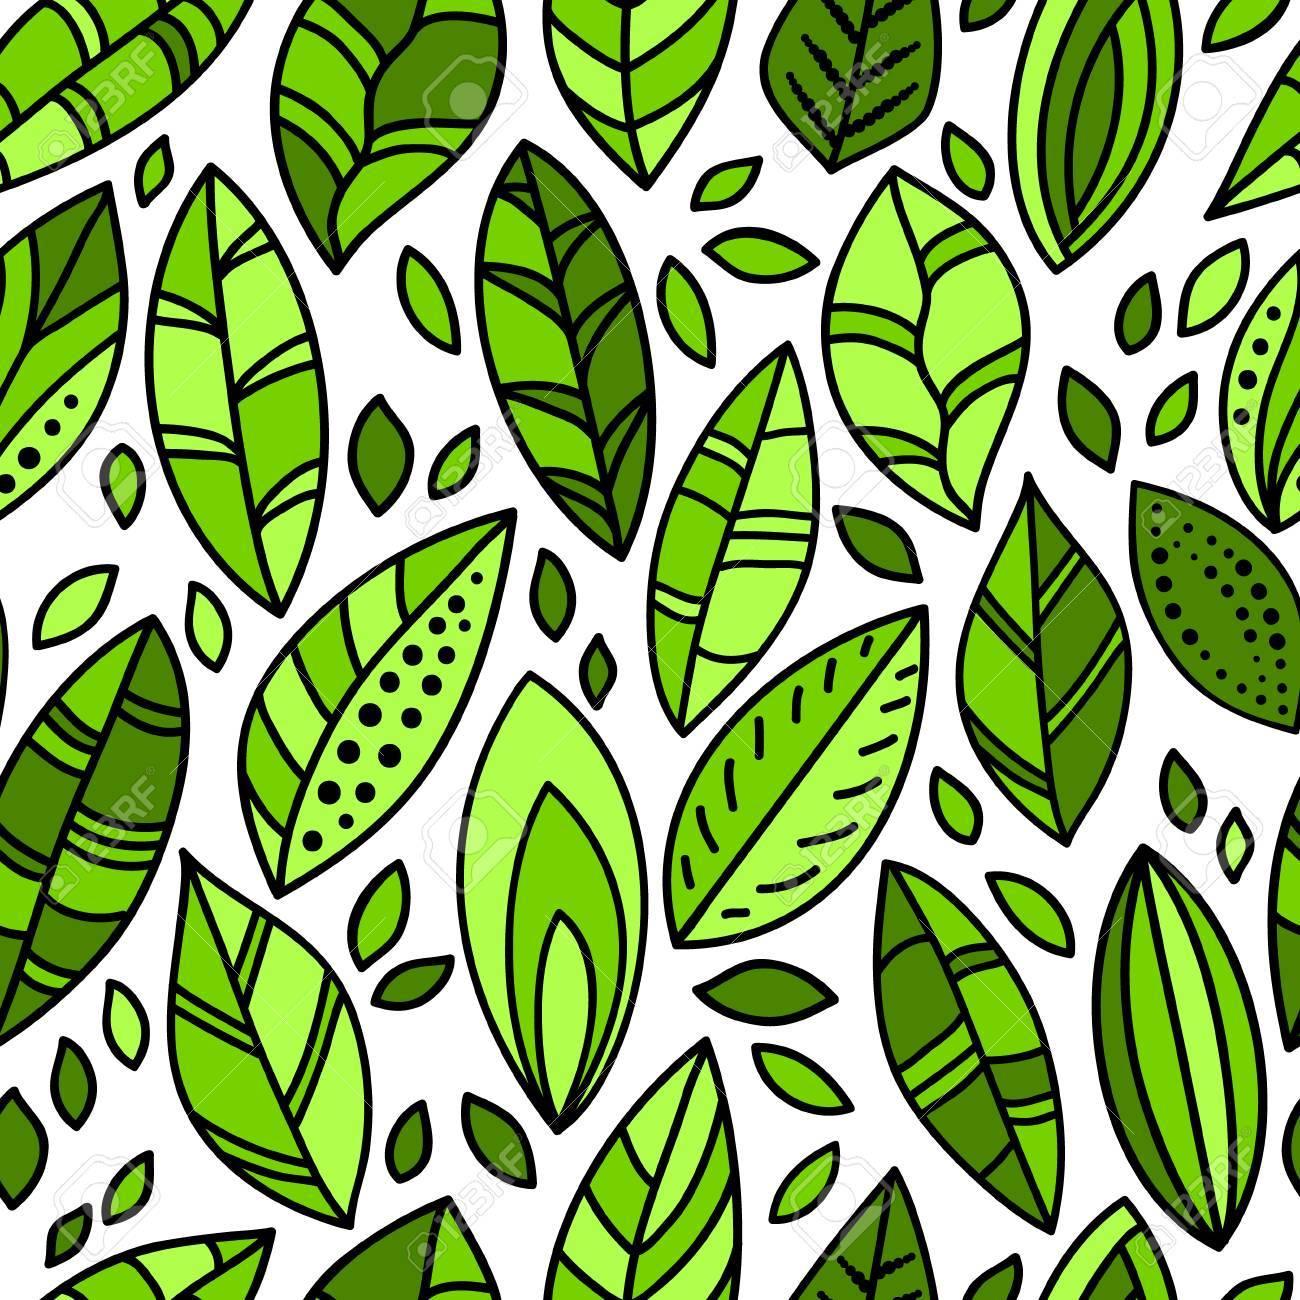 Green fresh leaves doodles on white seamless pattern - 25315551